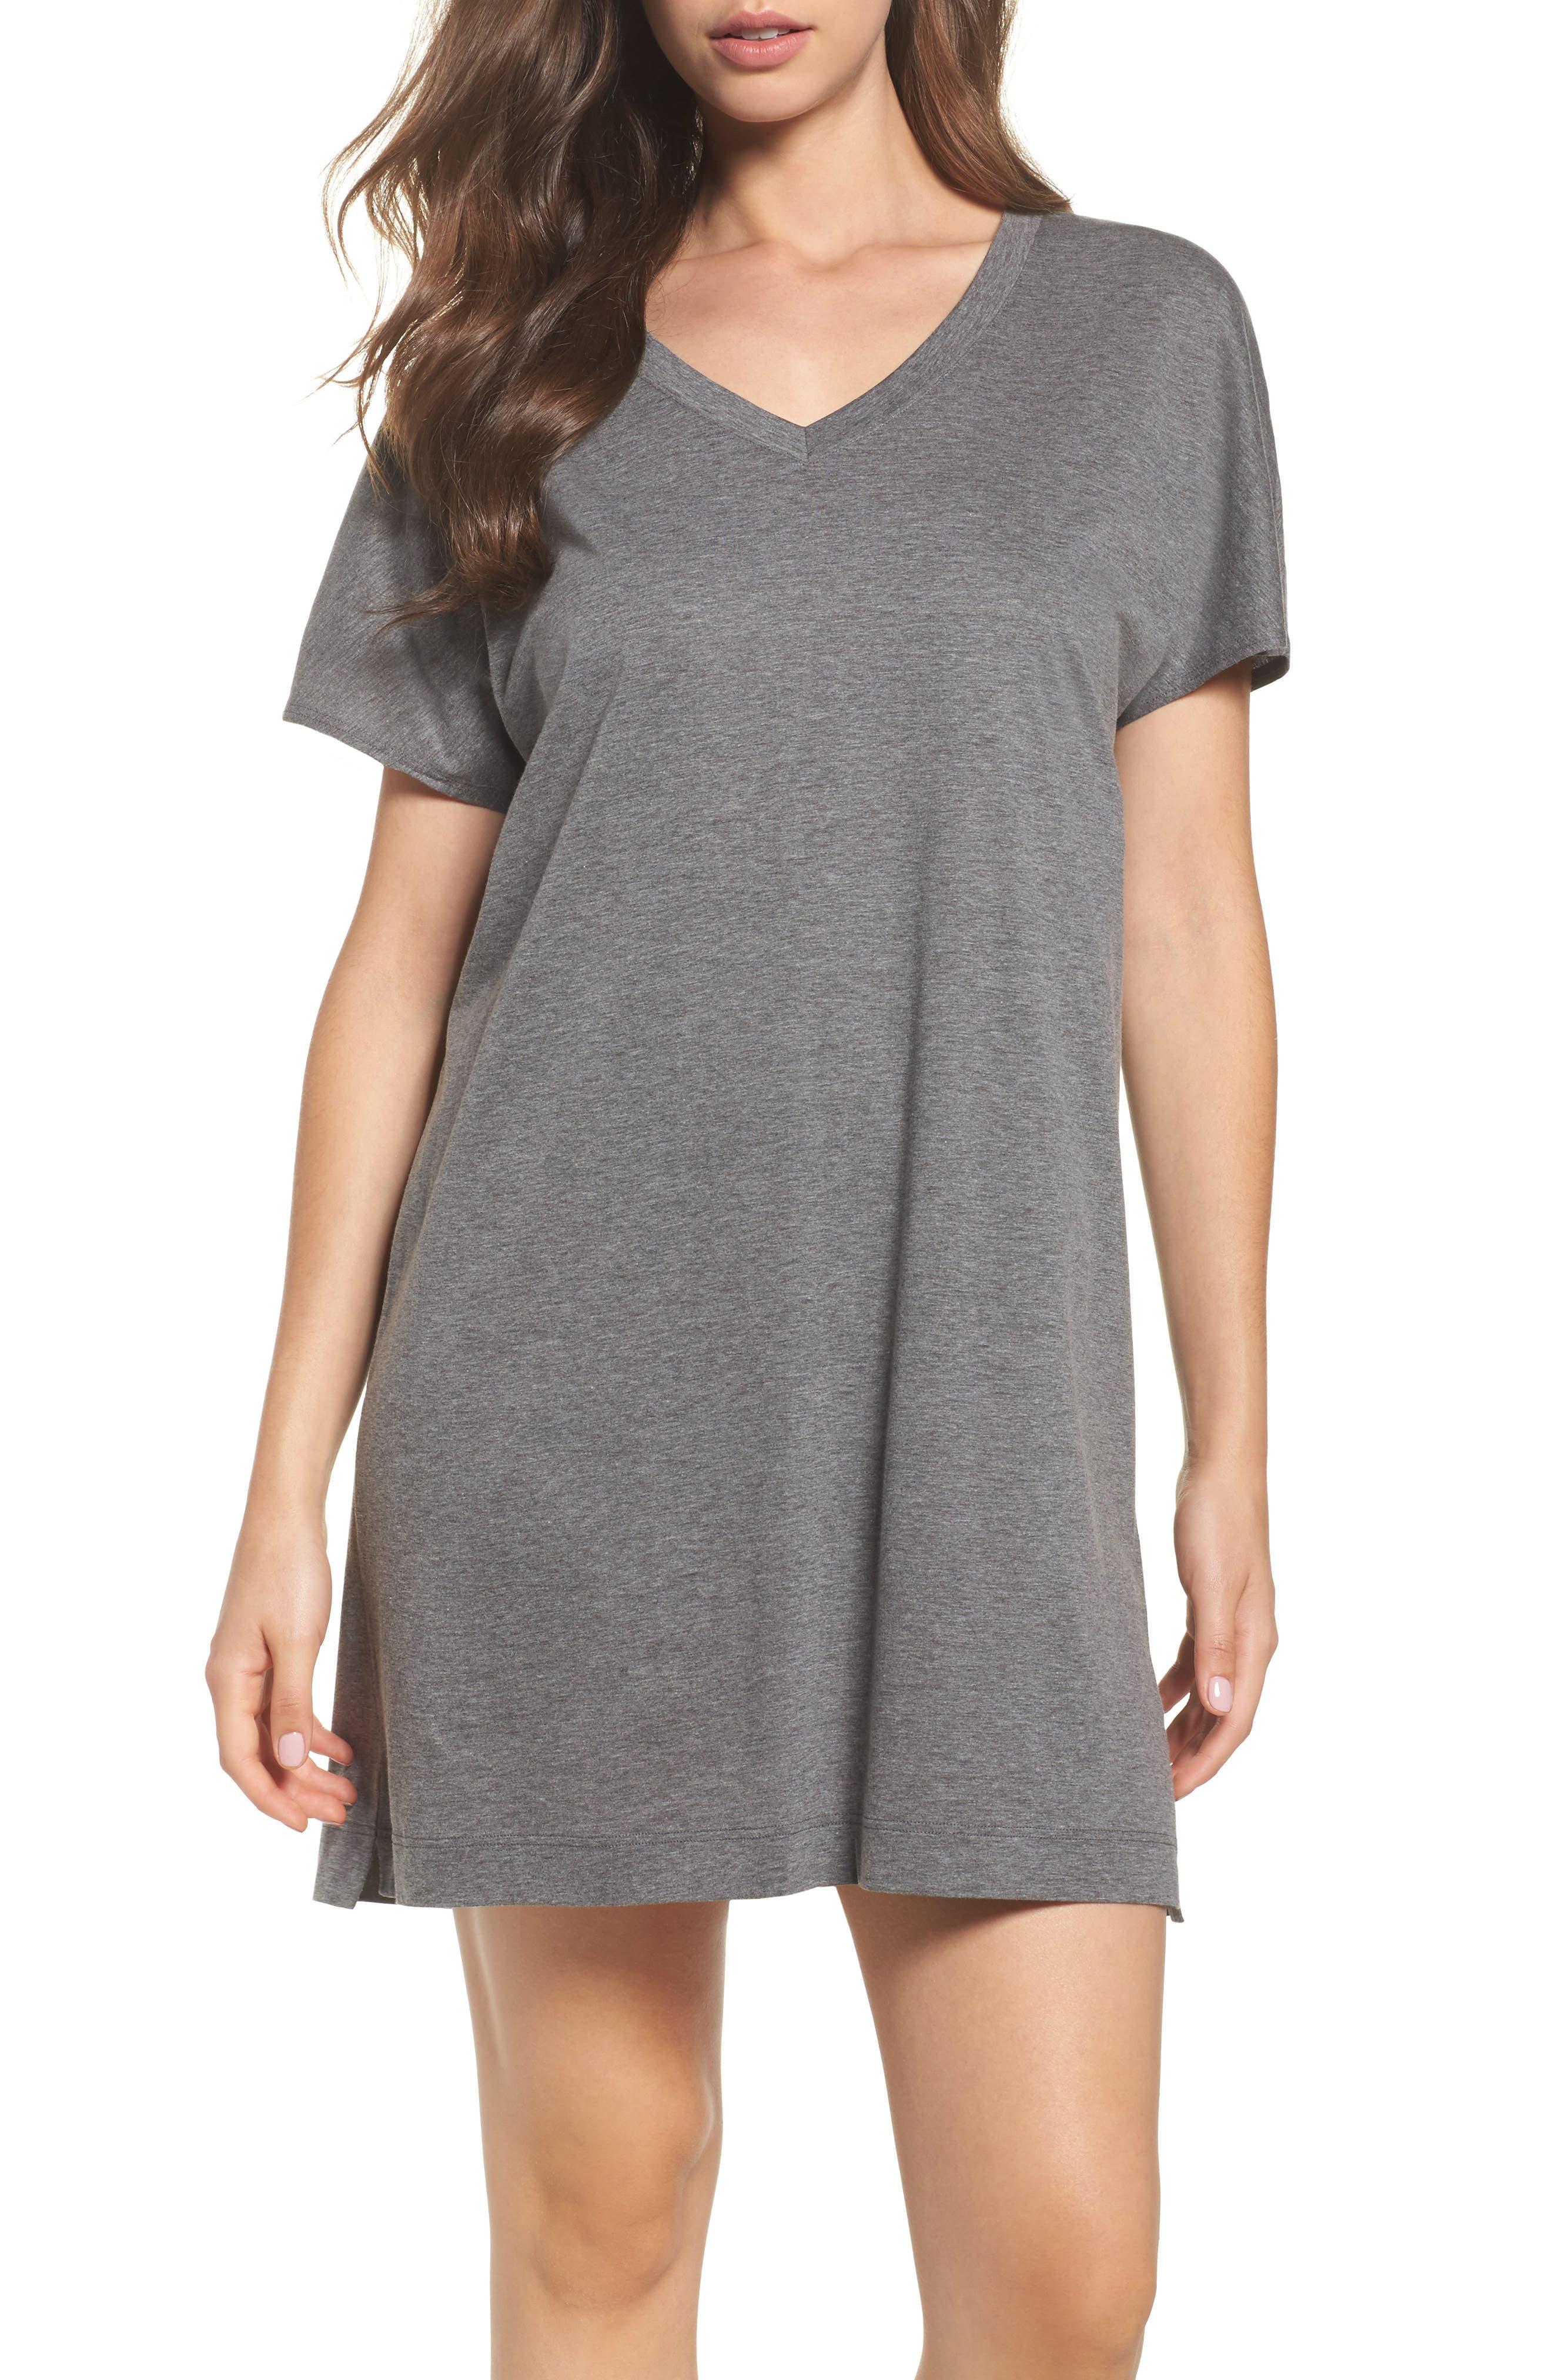 Alternate Image 1 Selected - Hanro Laura Jersey Sleep Shirt